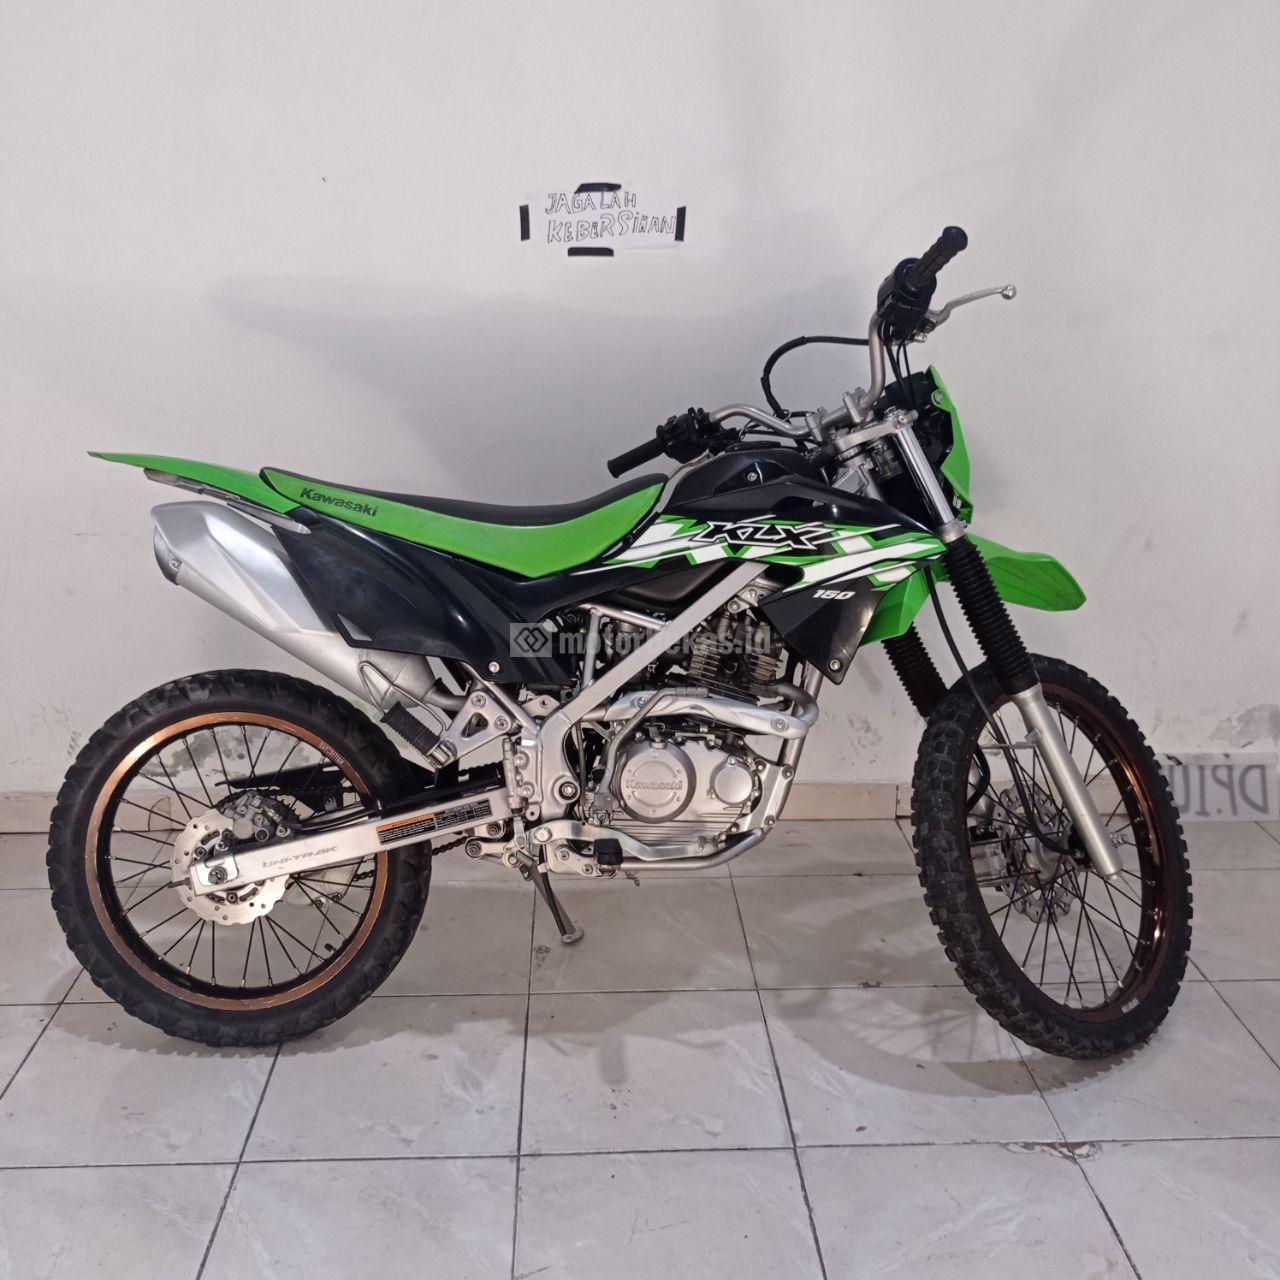 KAWASAKI KLX 150  621 motorbekas.id